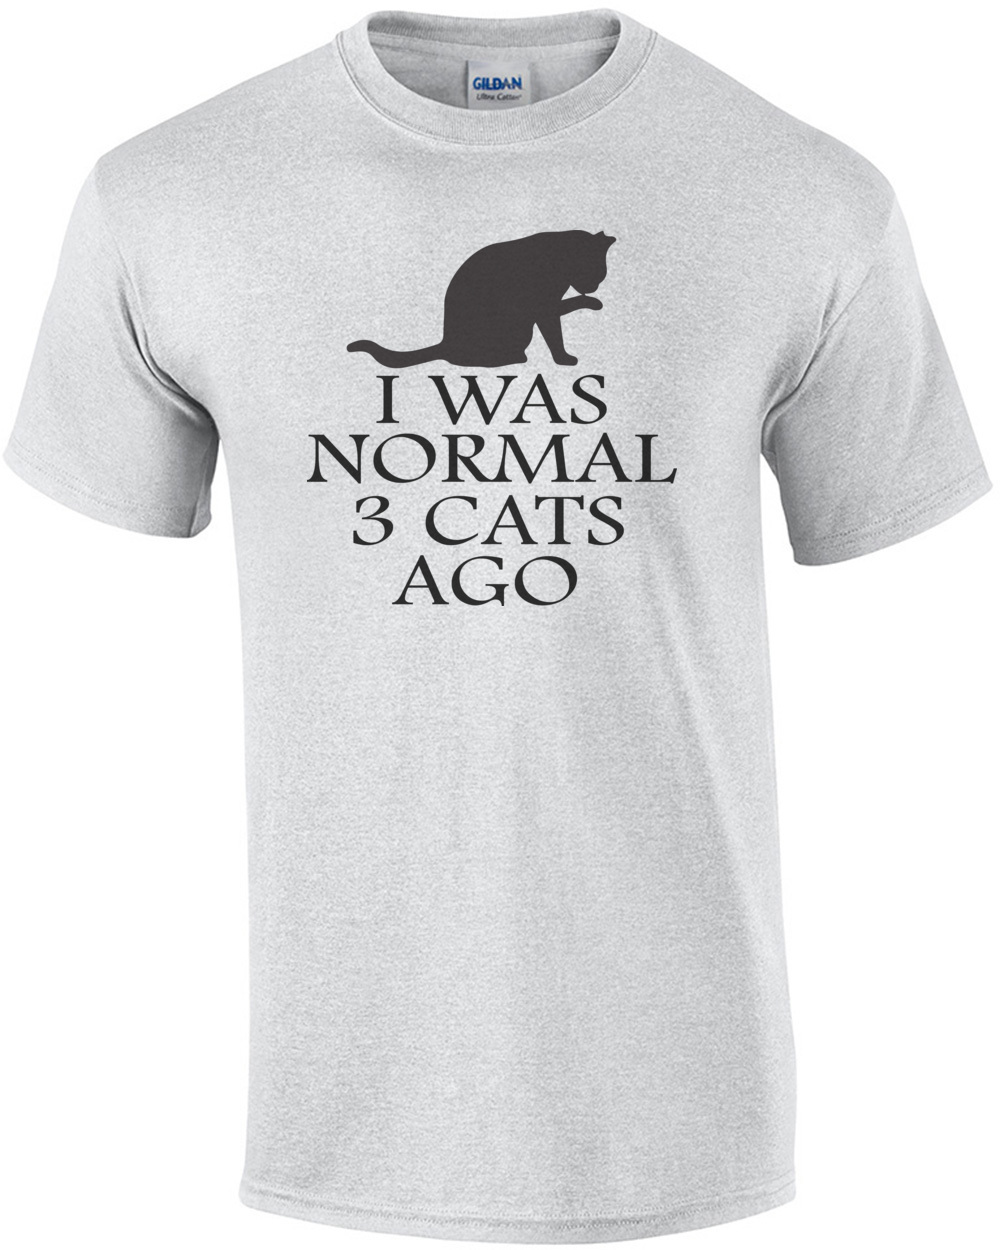 672e987222 Cheap Funny Cat T Shirts - DREAMWORKS